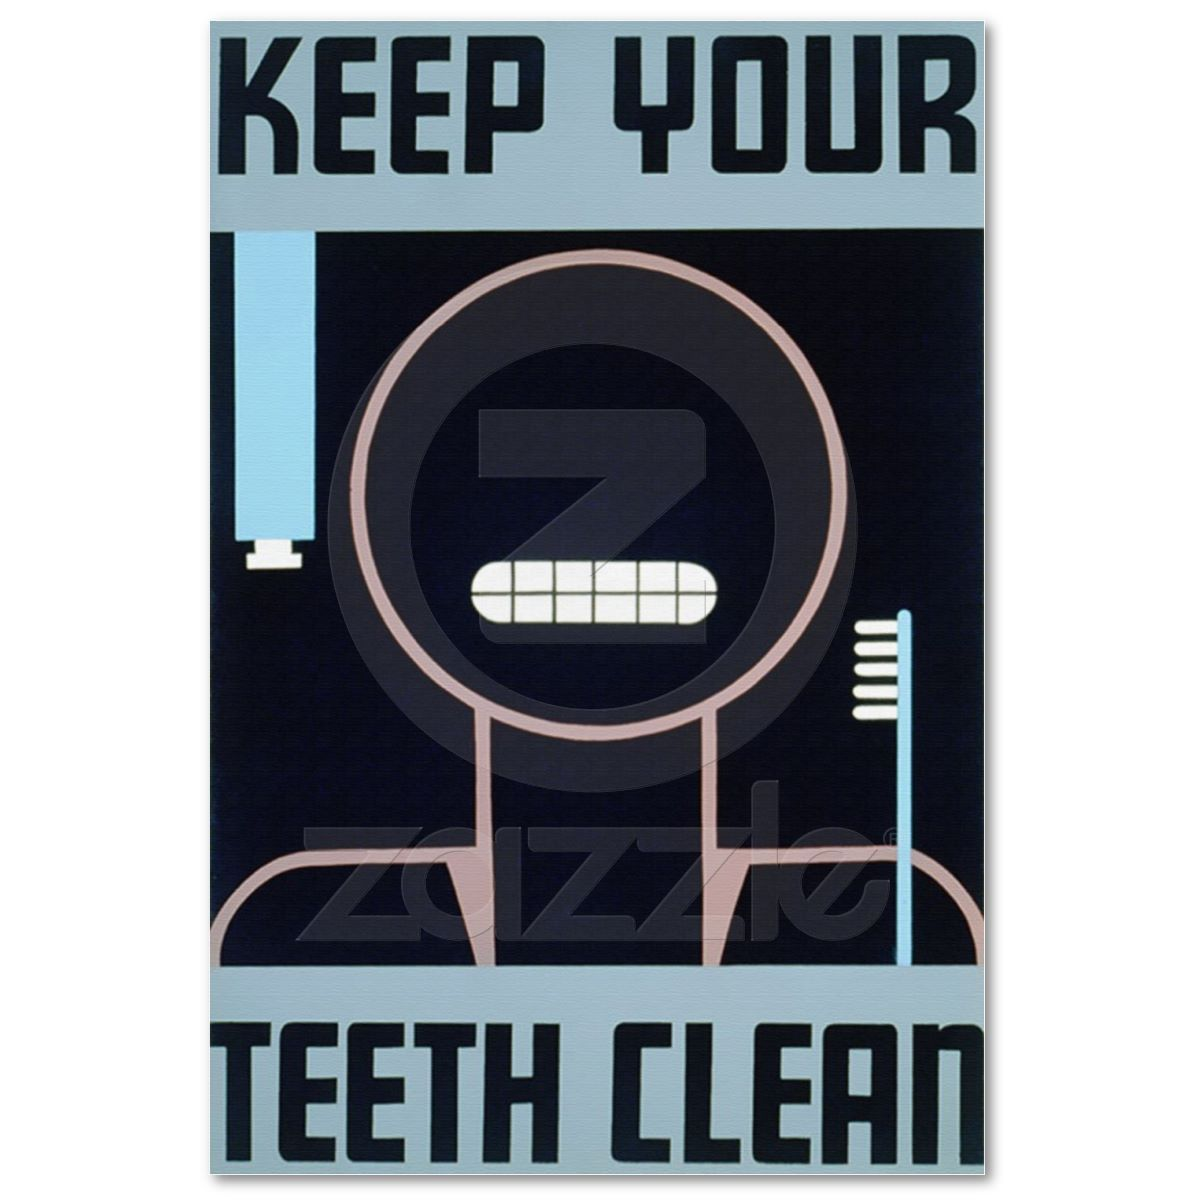 Keep Your Teeth Clean Poster Zazzle.co.uk Teeth